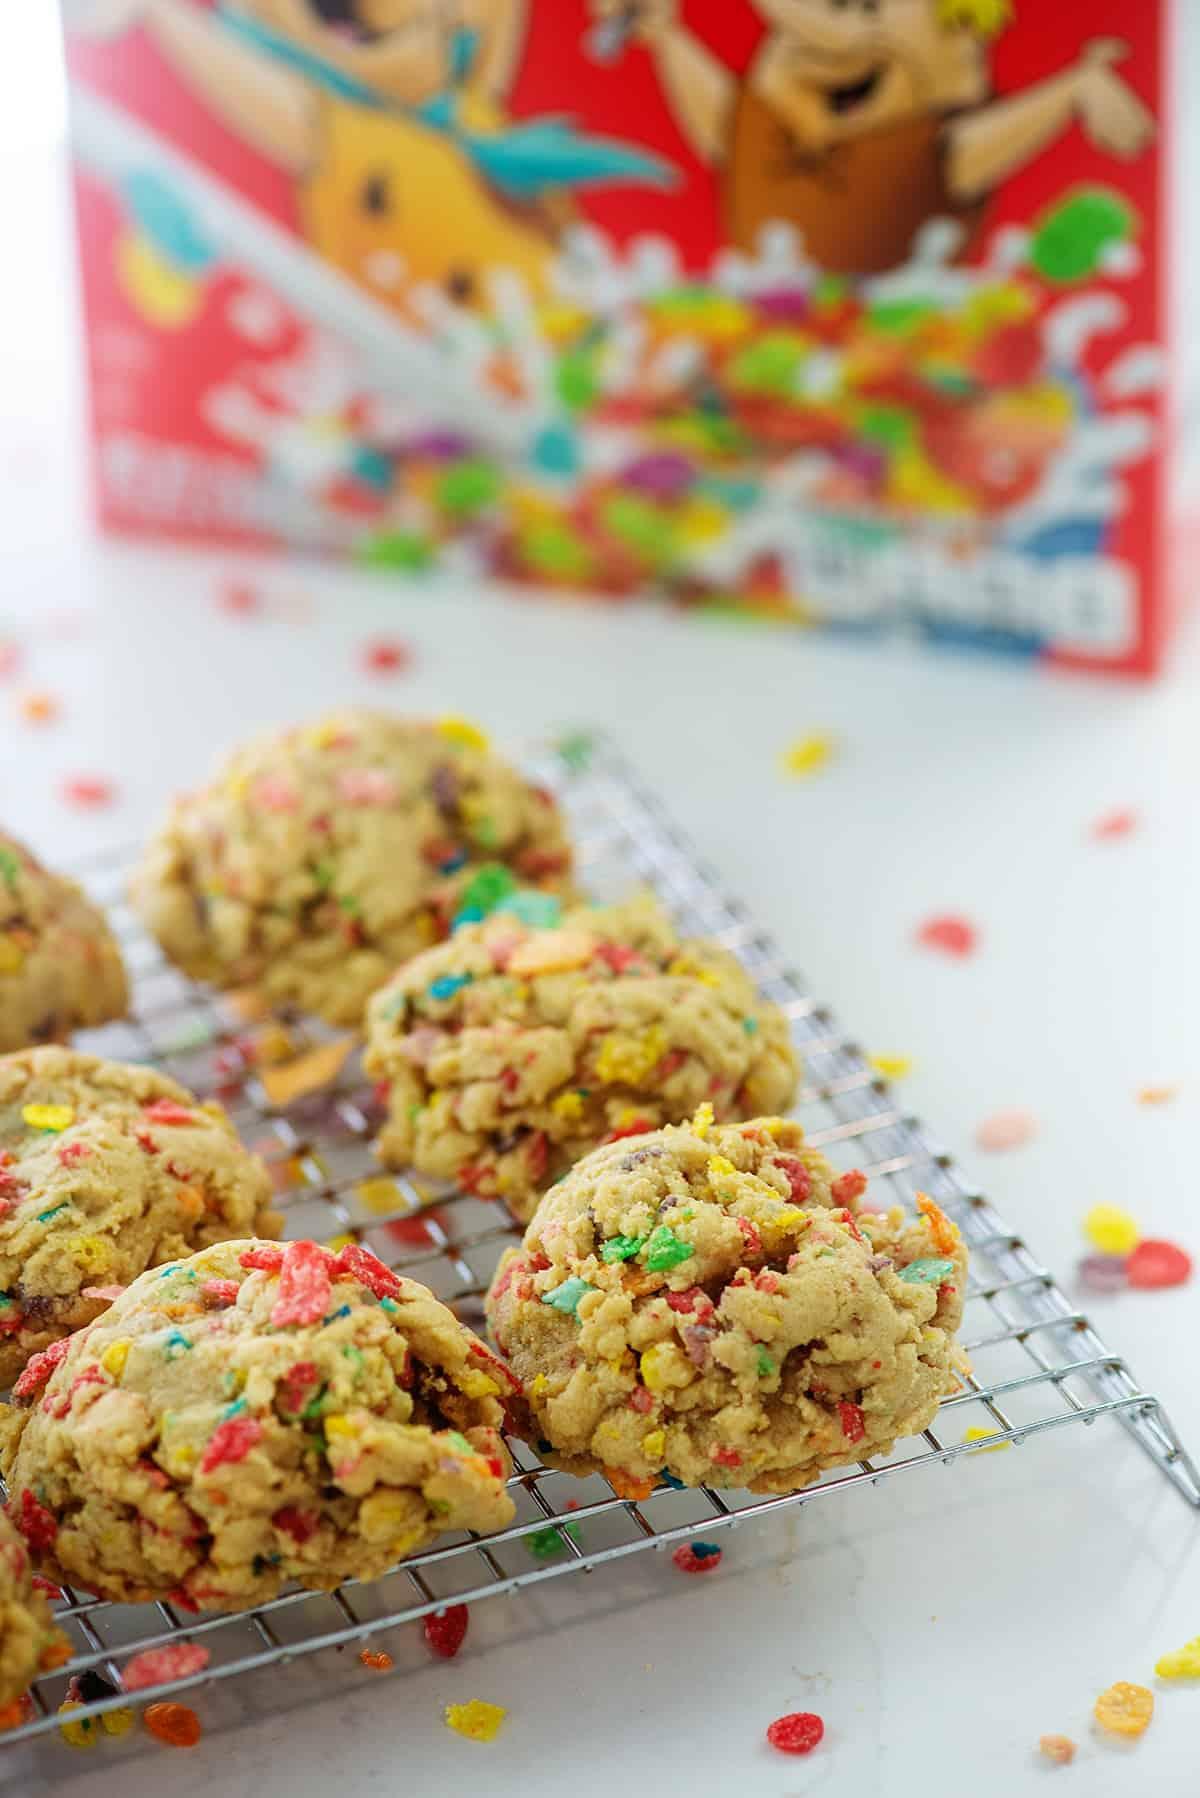 fruity pebbles cookies on cooling rack.